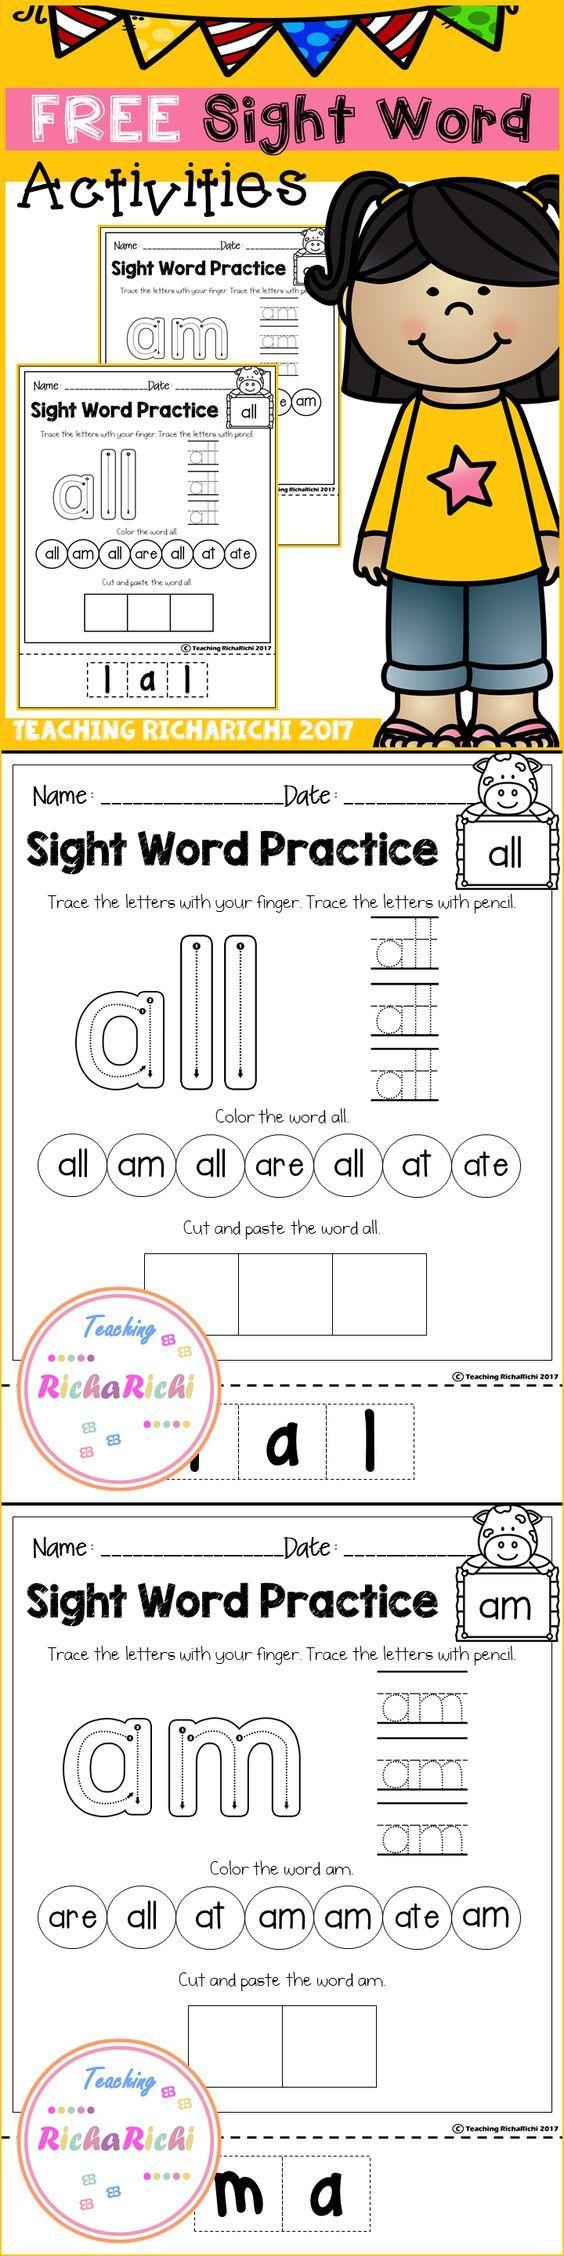 Uncategorized First Grade Worksheet best 25 first grade worksheets ideas on pinterest freebies free kindergarten activities pre k activities